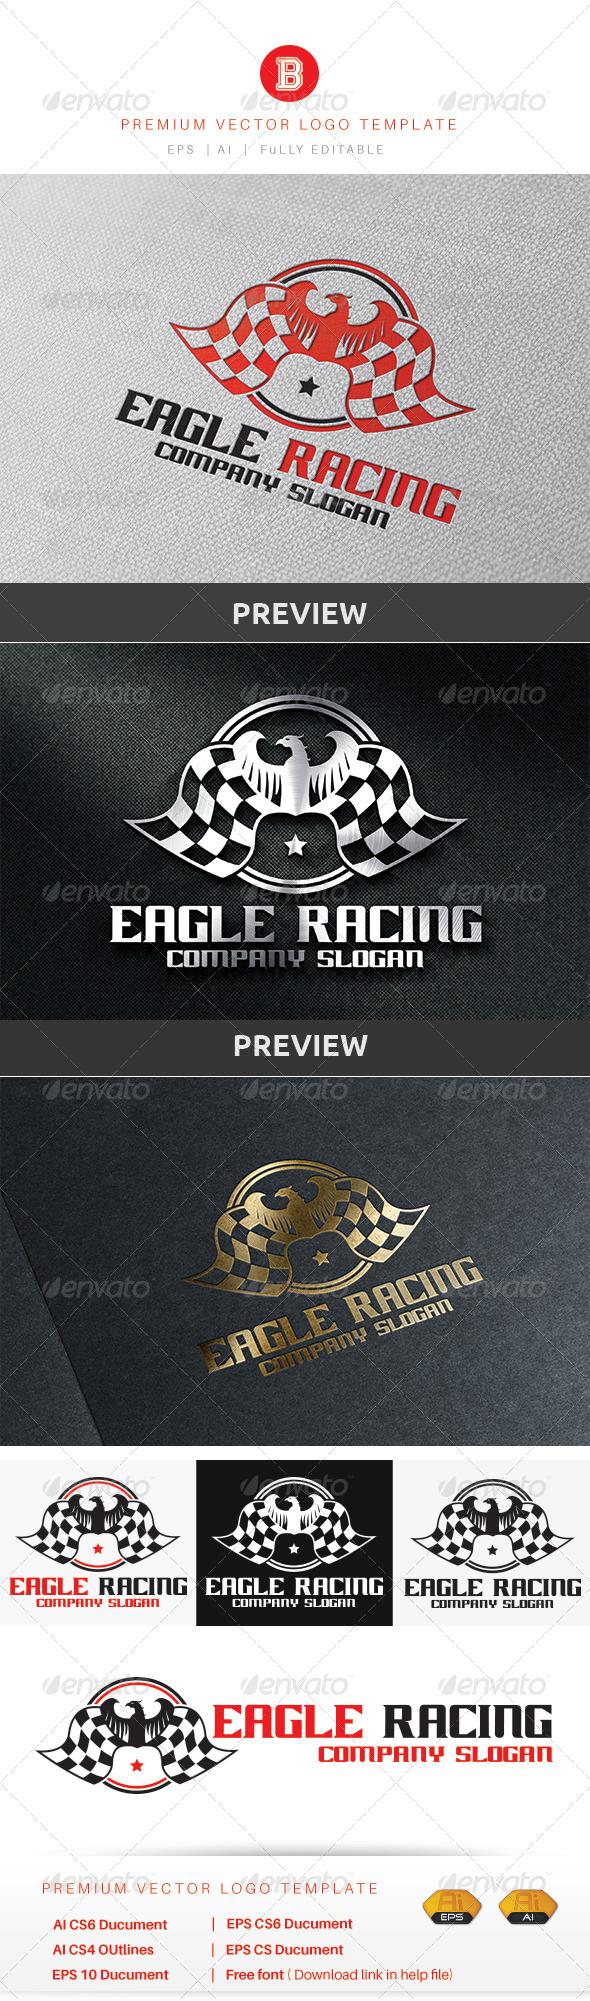 GraphicRiver Eagle Racing 8755898